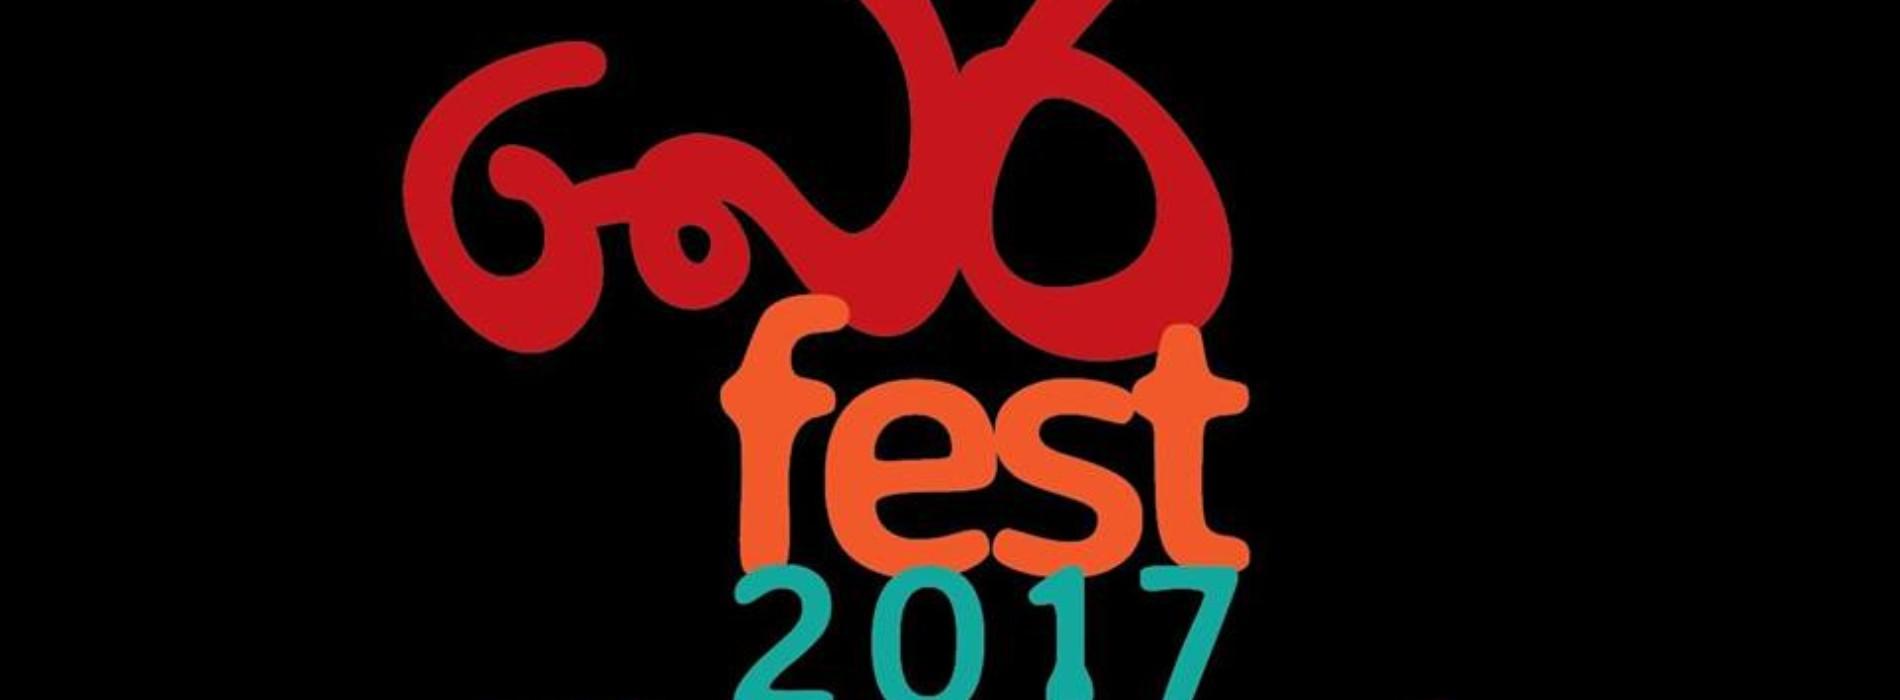 The Bera Fest